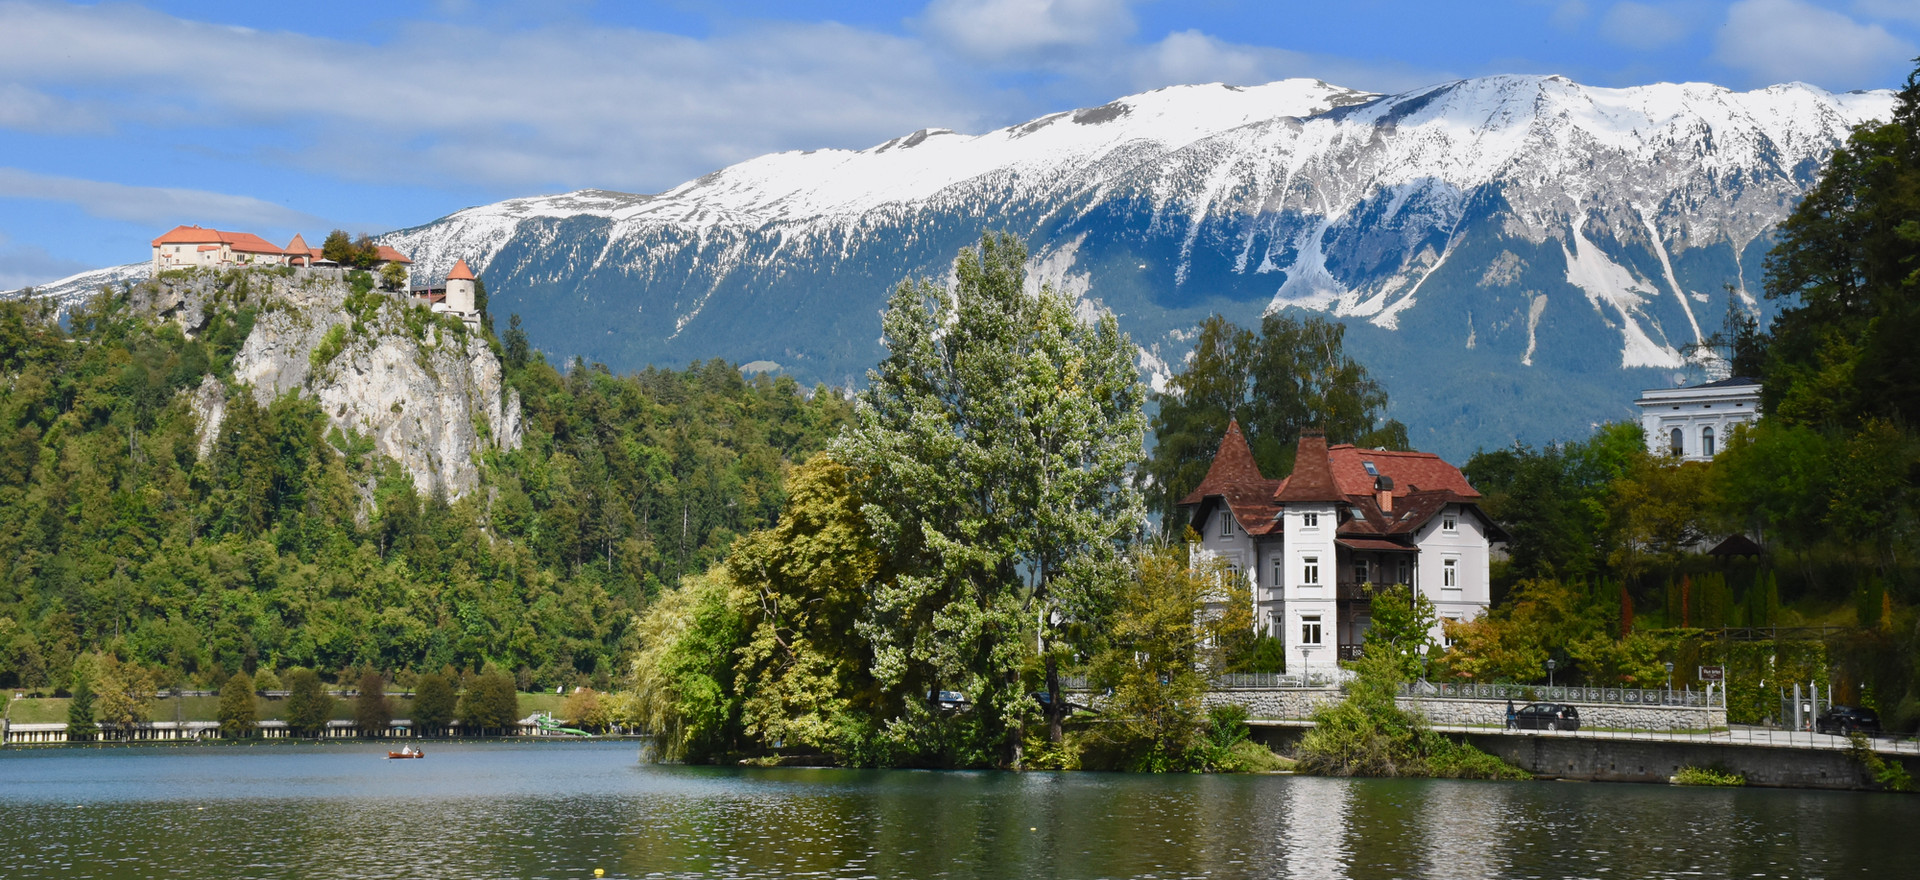 Villa Adora has a perfect setting by the lake